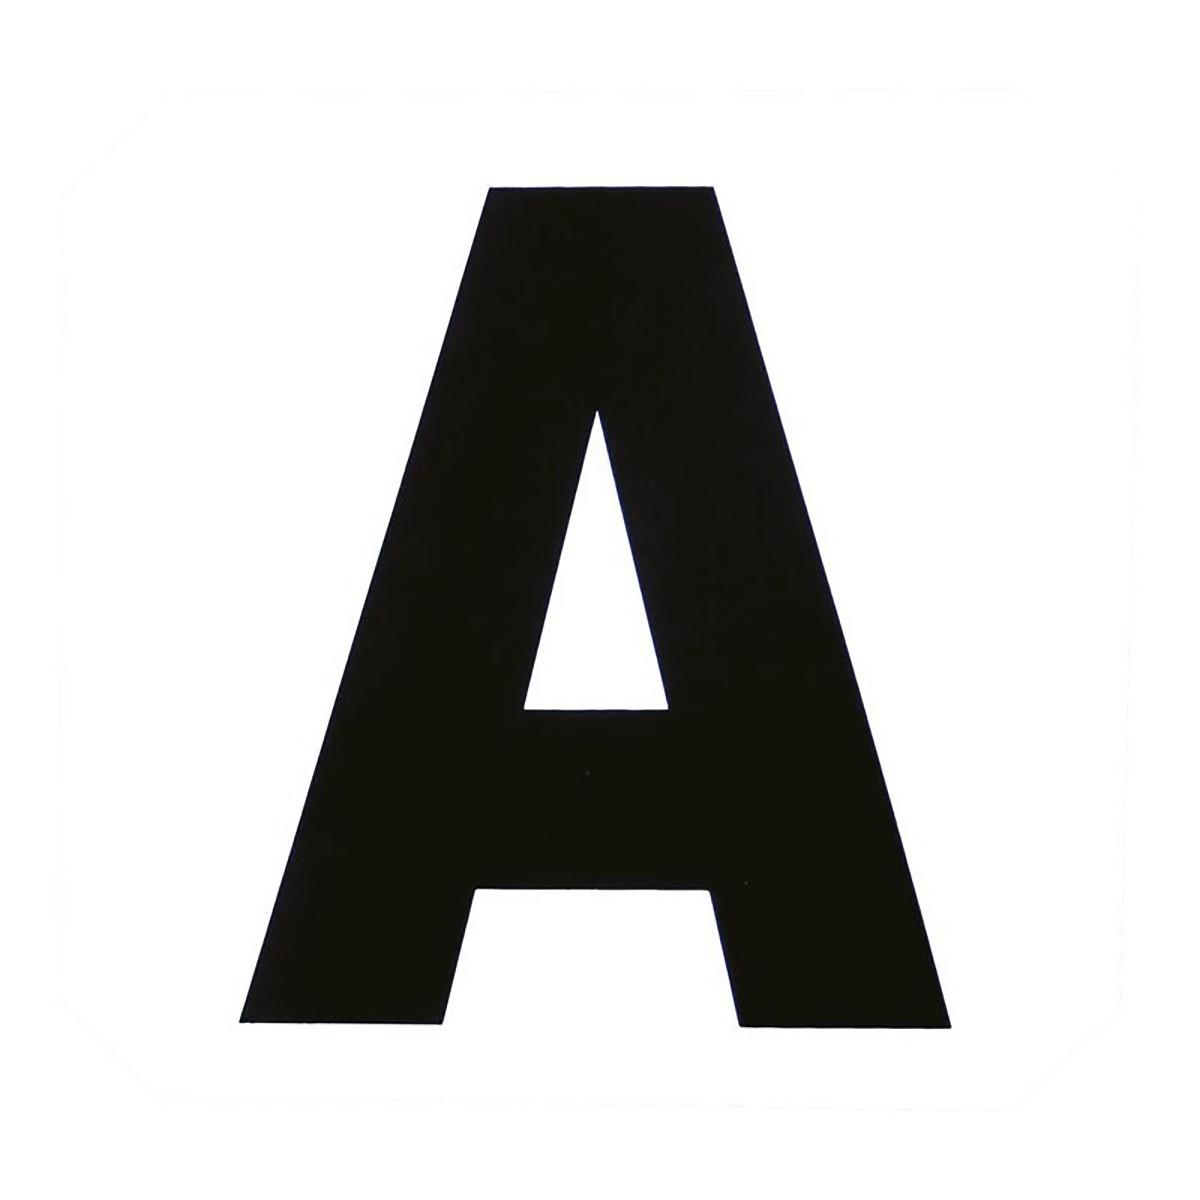 Set Of 12 Dressage Letters Sticker Markers